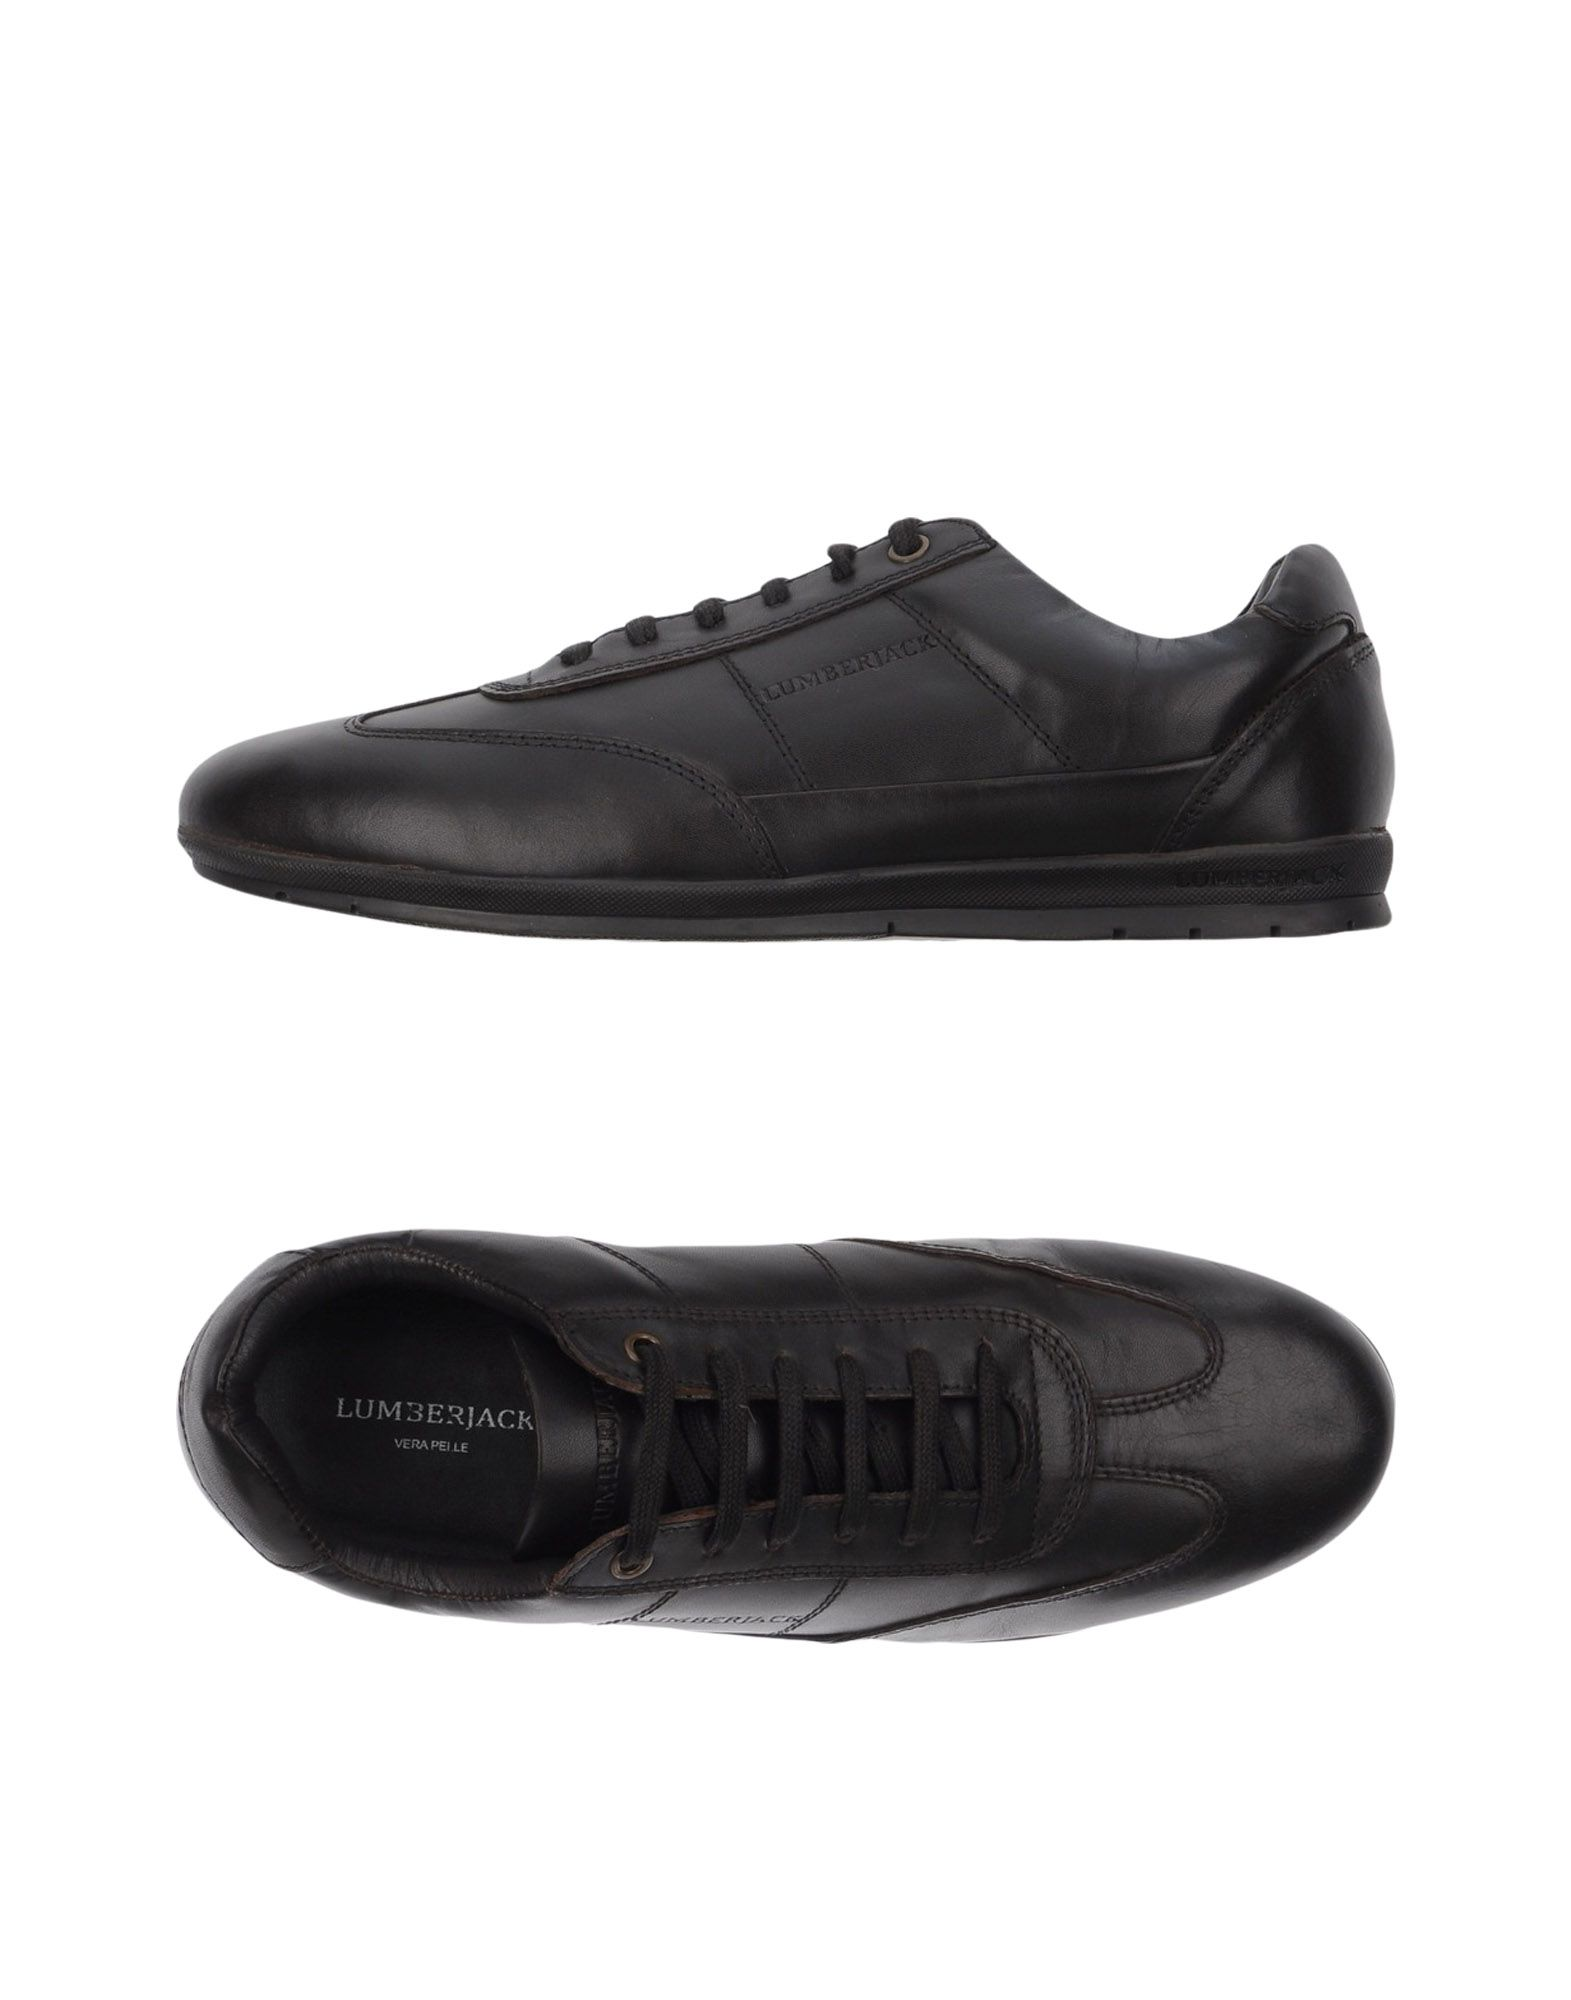 fabd6df4f5c LUMBERJACK ΠΑΠΟΥΤΣΙΑ Παπούτσια τένις χαμηλά, Ανδρικά παπούτσια ...